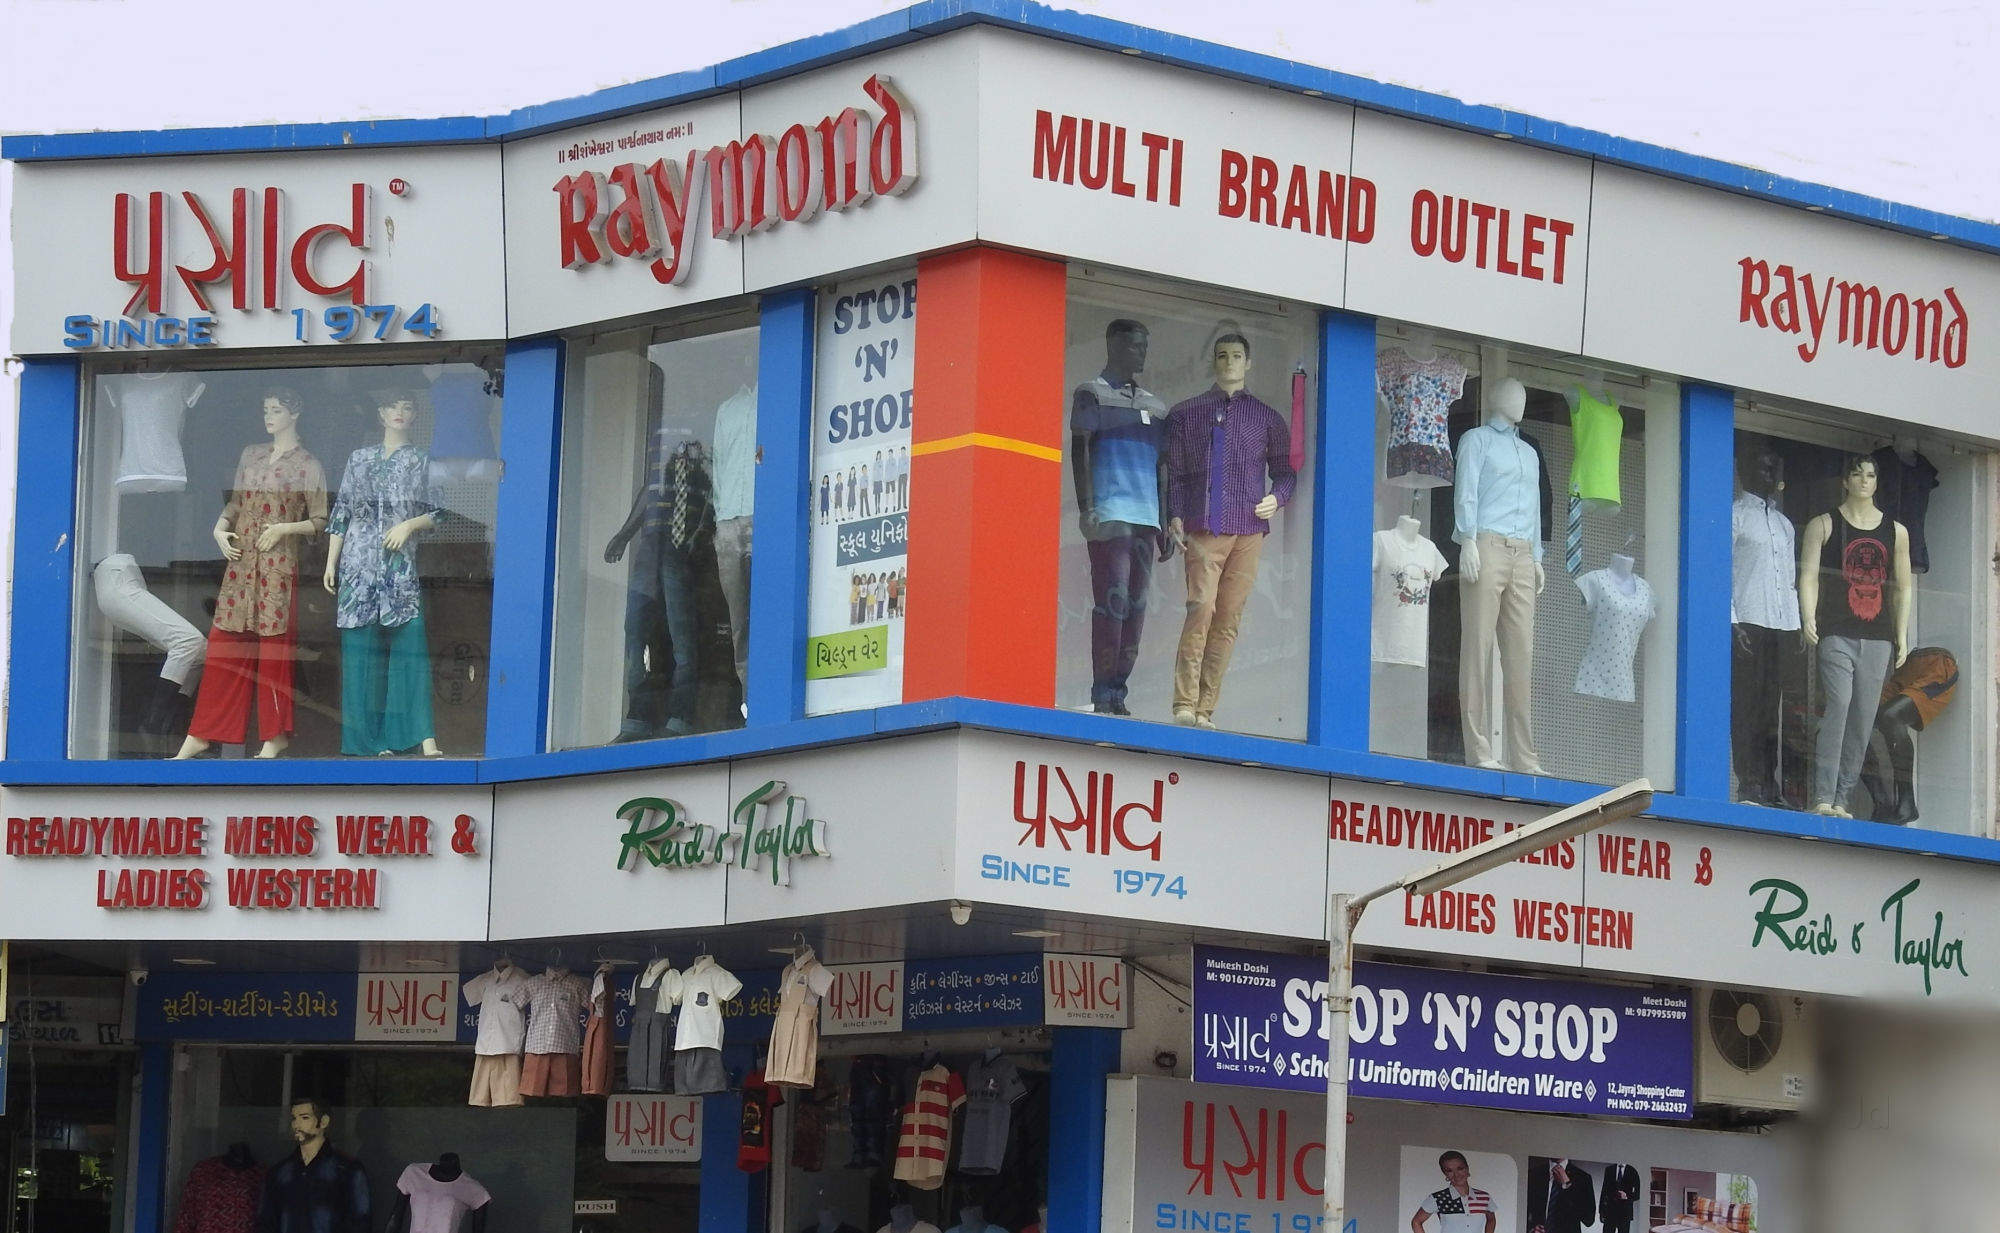 80f62c79d16 Top 100 Readymade Garment Shop in Paldi, Ahmedabad - Best Readymade ...